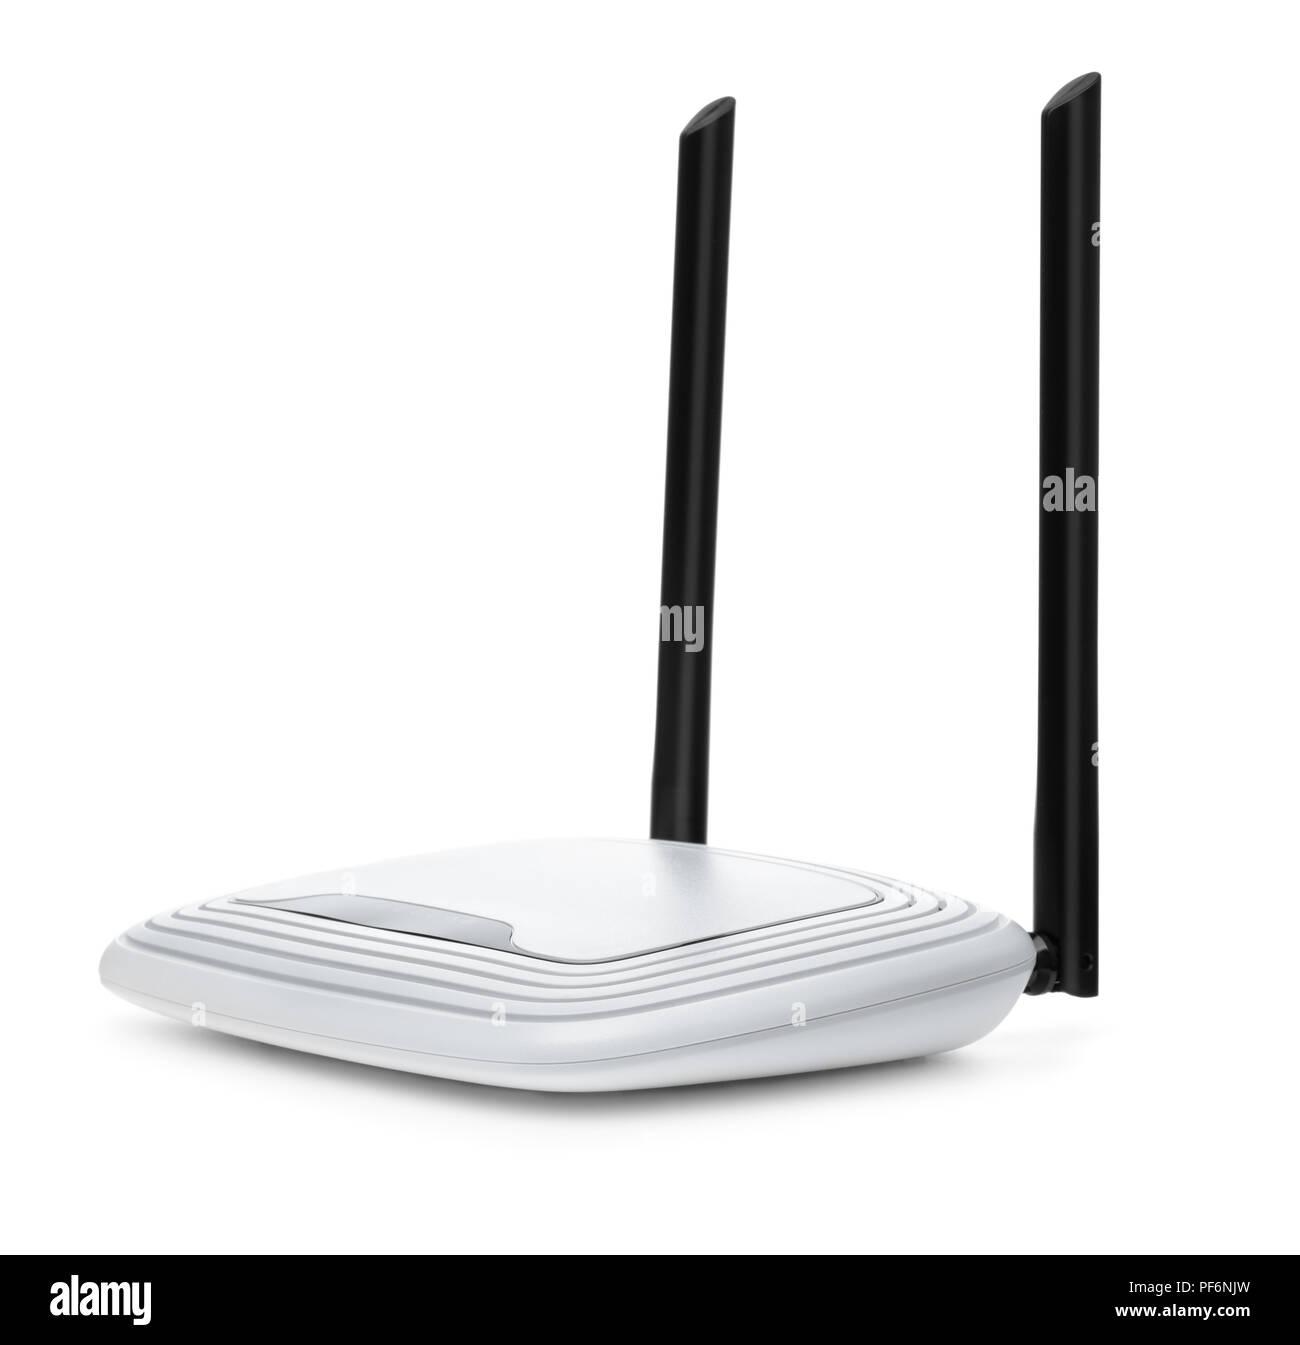 Router wi-fi inalámbrico aislado en blanco Imagen De Stock